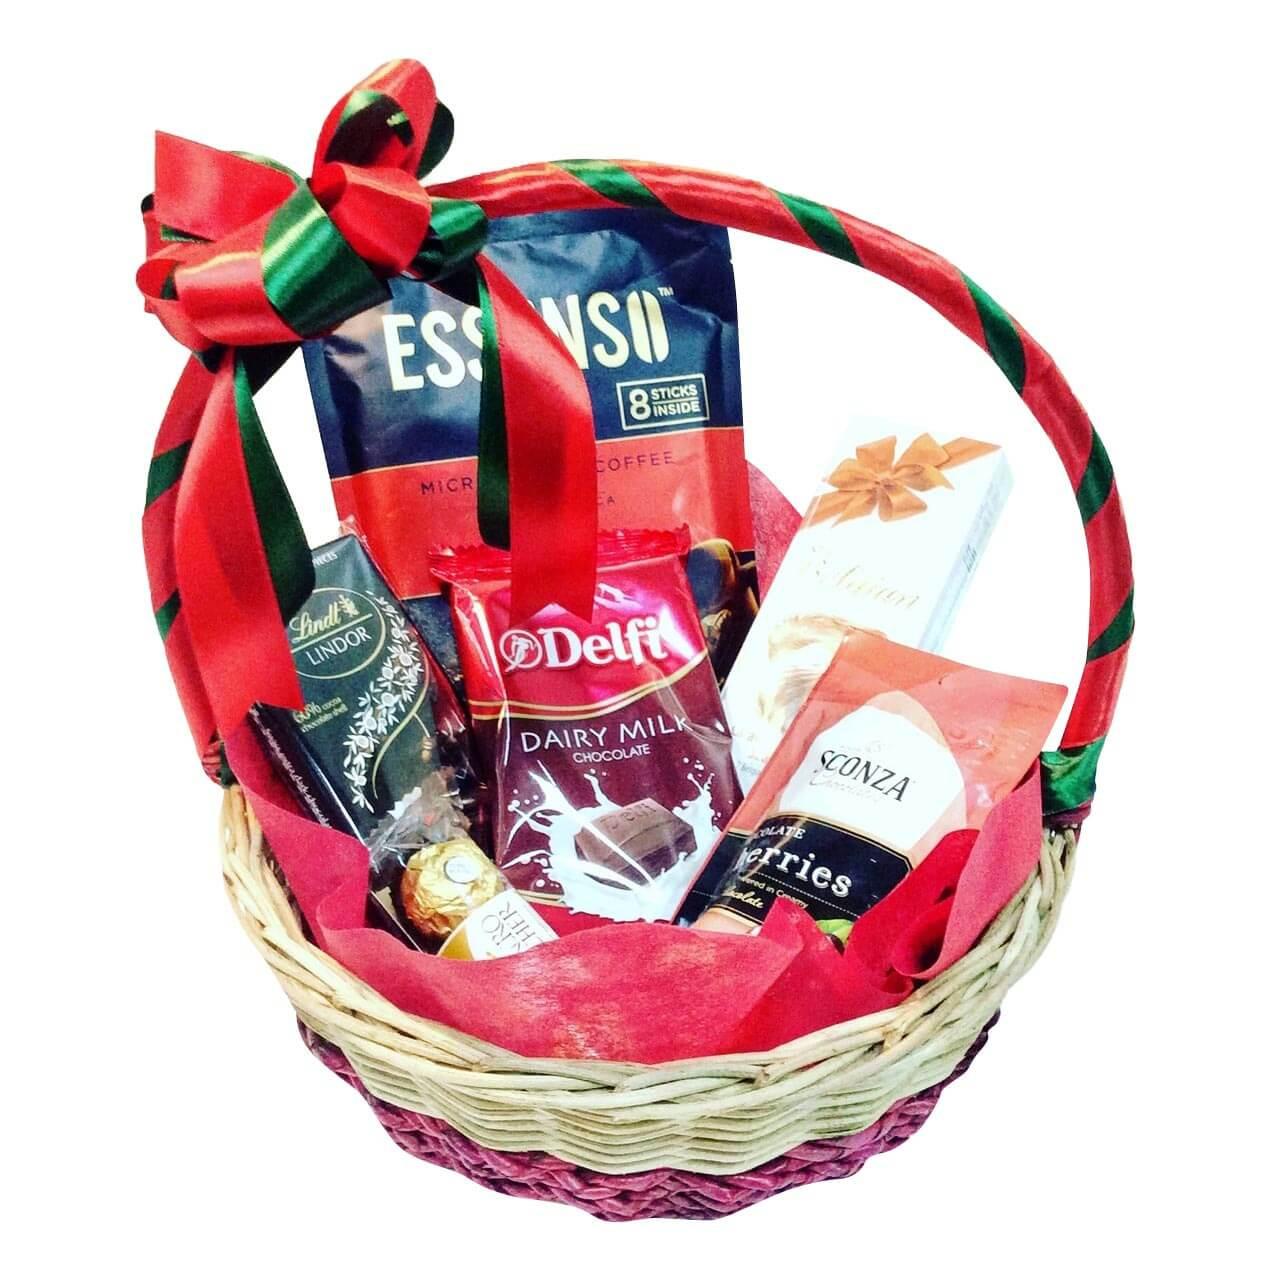 Coffee & Bonbons Basket